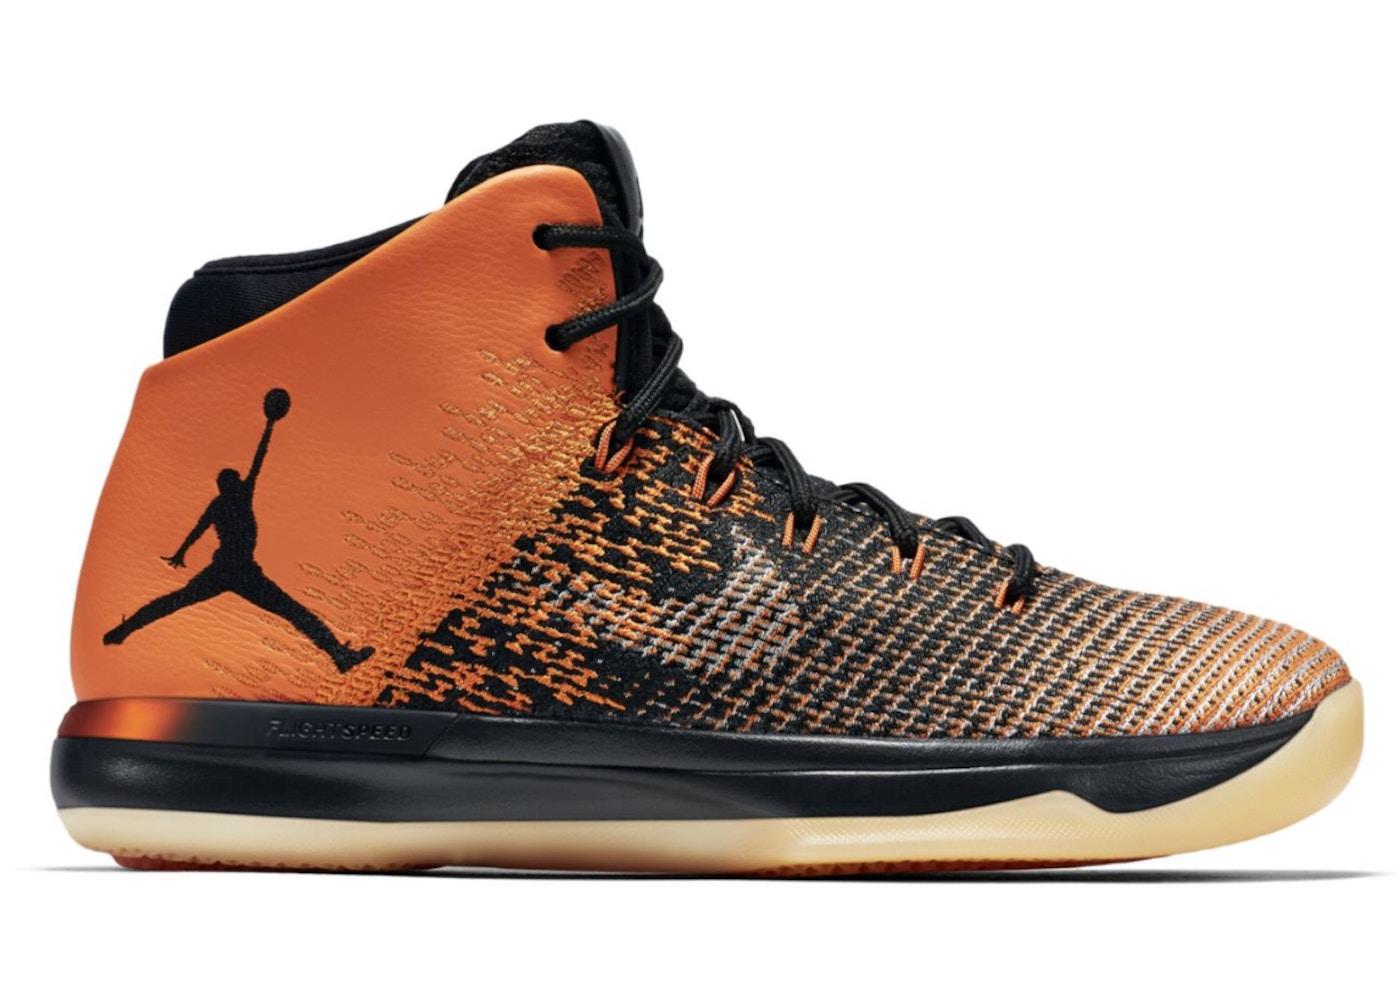 Buy Air Jordan 31 Shoes Deadstock Sneakers